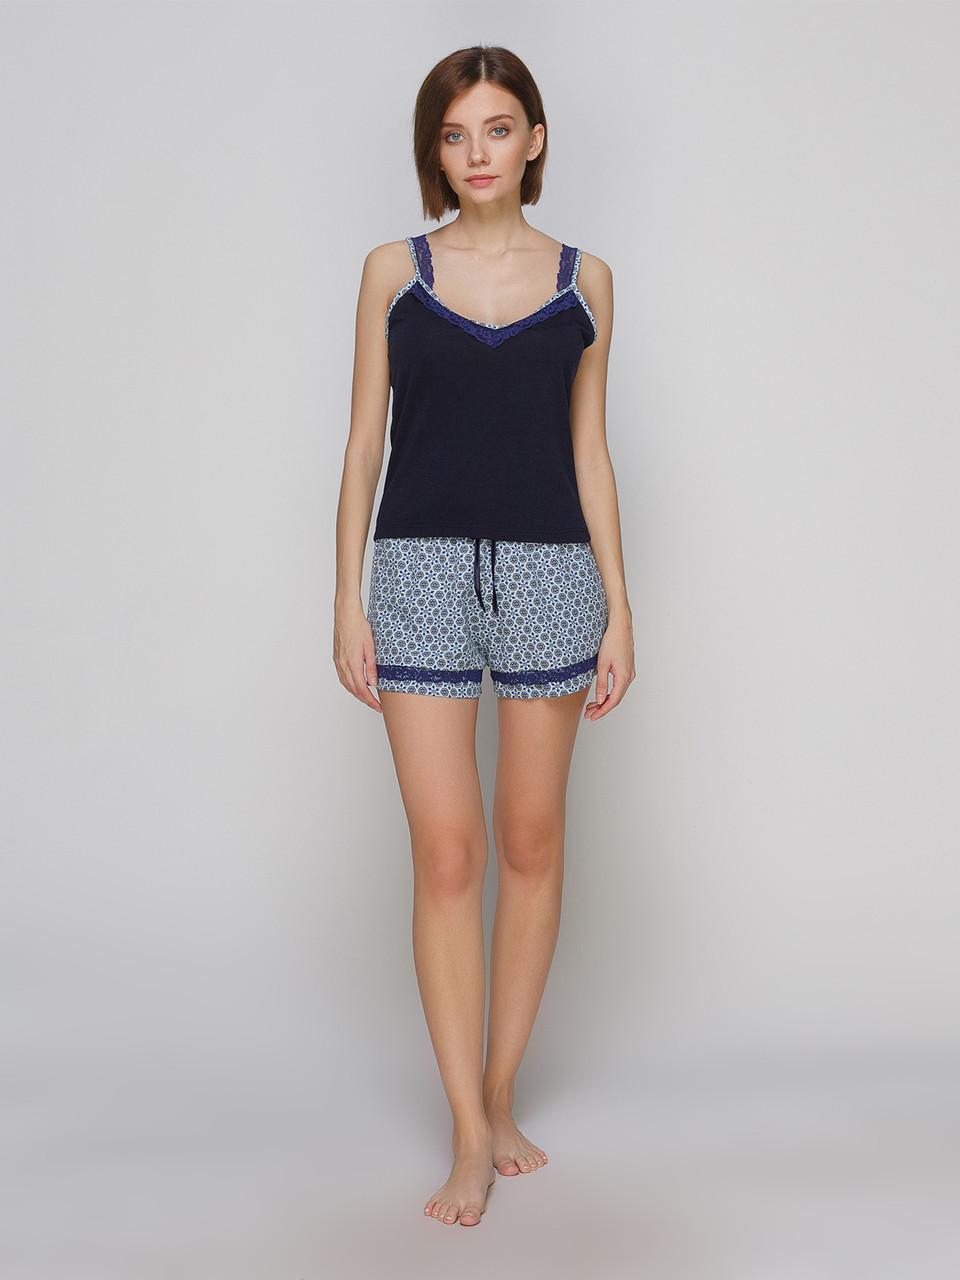 Комплект майка шорты из шелка Армани Serenade синий с нежным кружевом